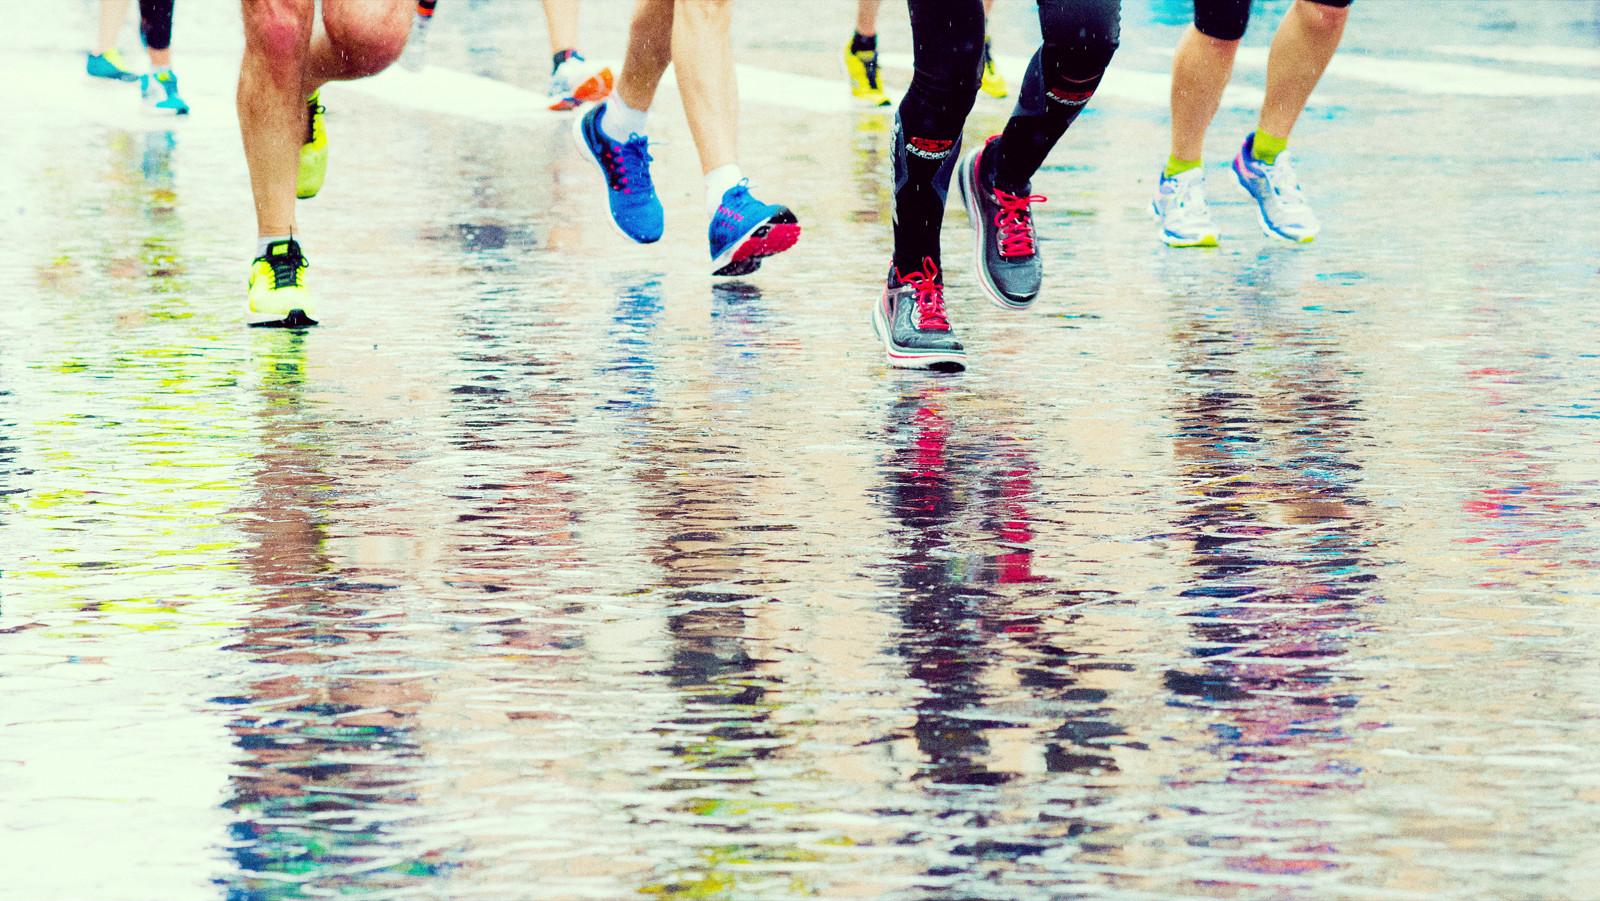 USATF 50 km Race Walk Championships 2020 Results Leaderboard